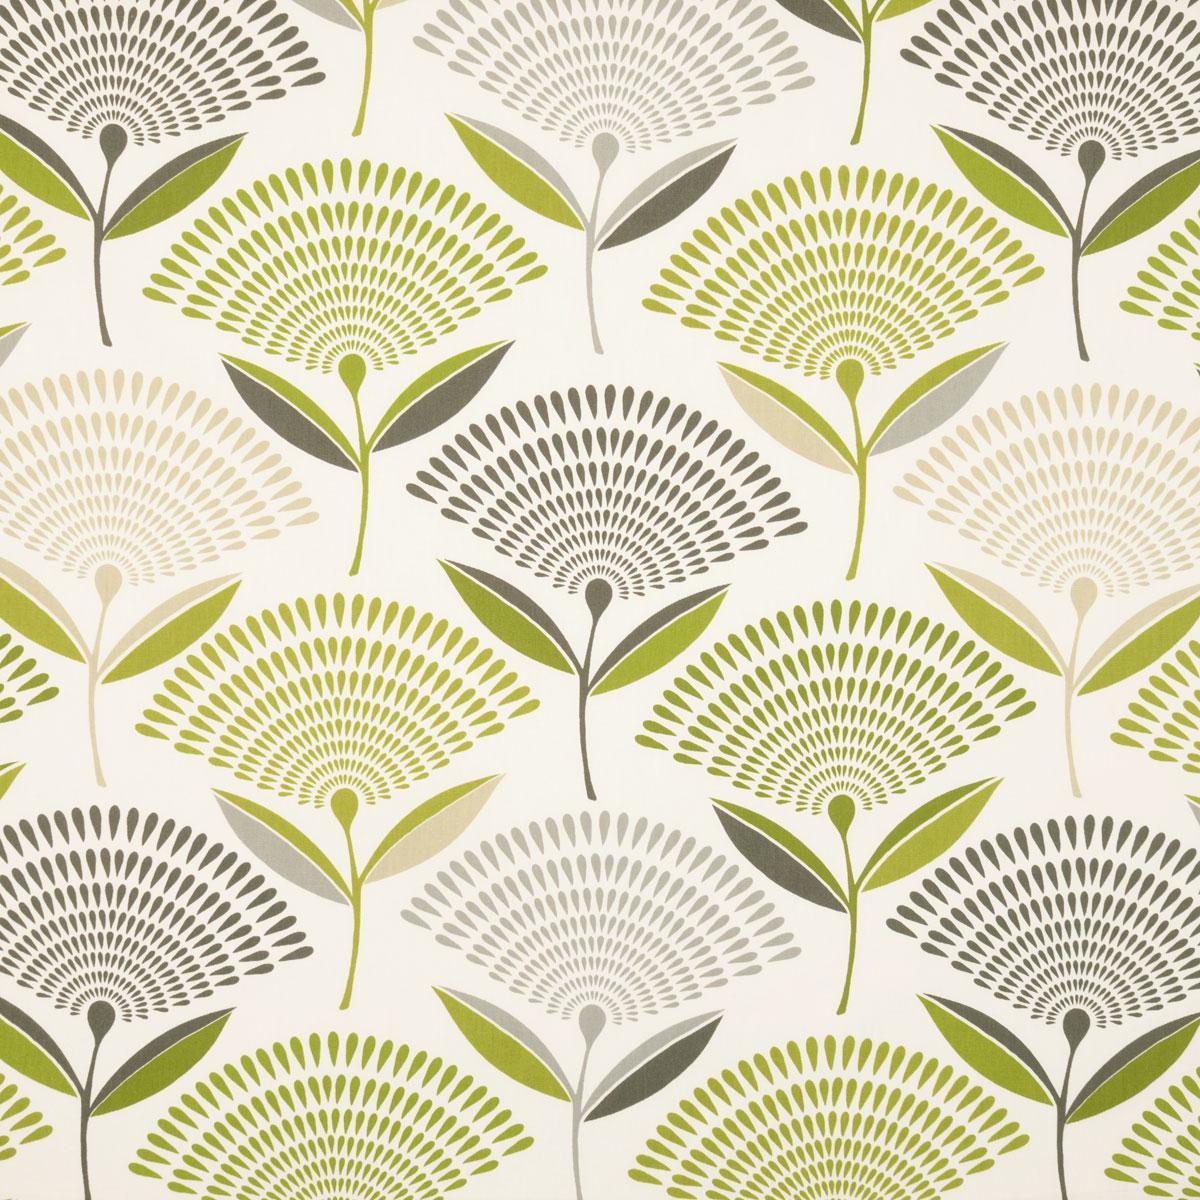 Dandelion Curtain Fabric - eucalyptus - Terrys Fabrics UK